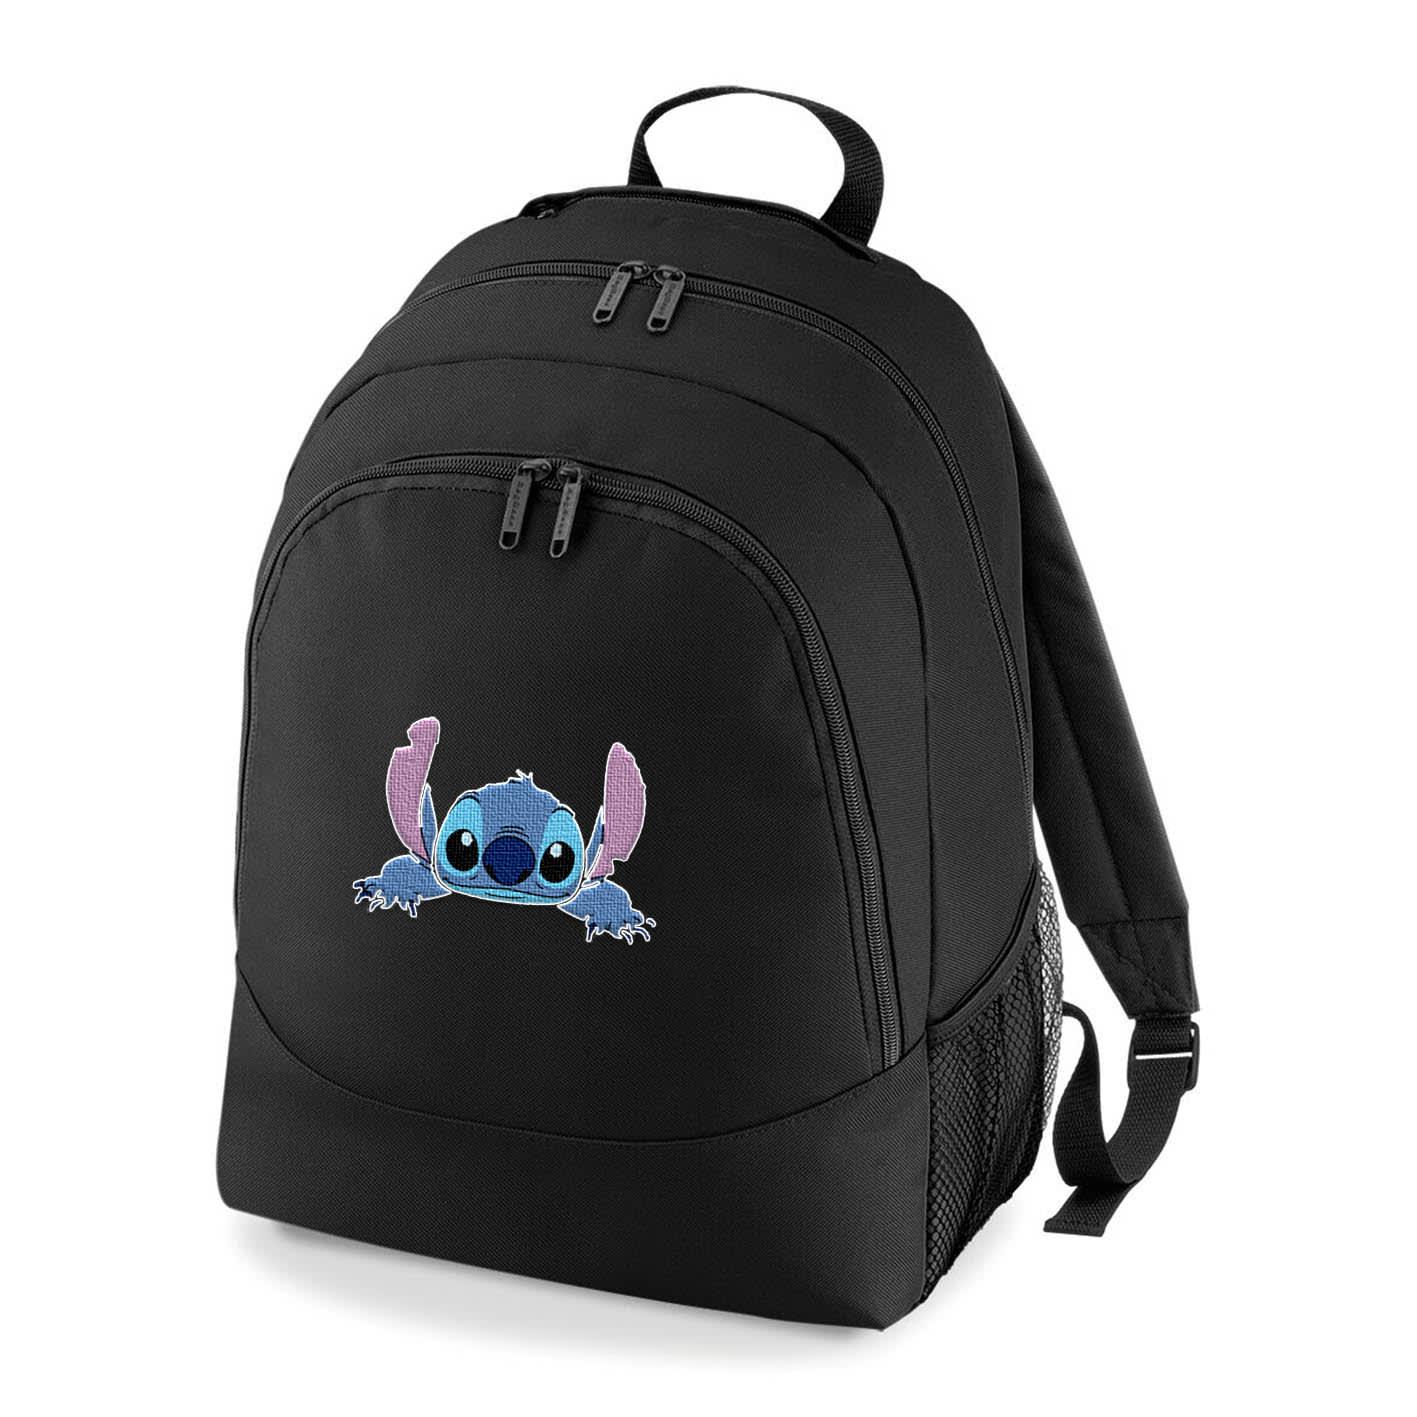 Stitch Rucksack Bag